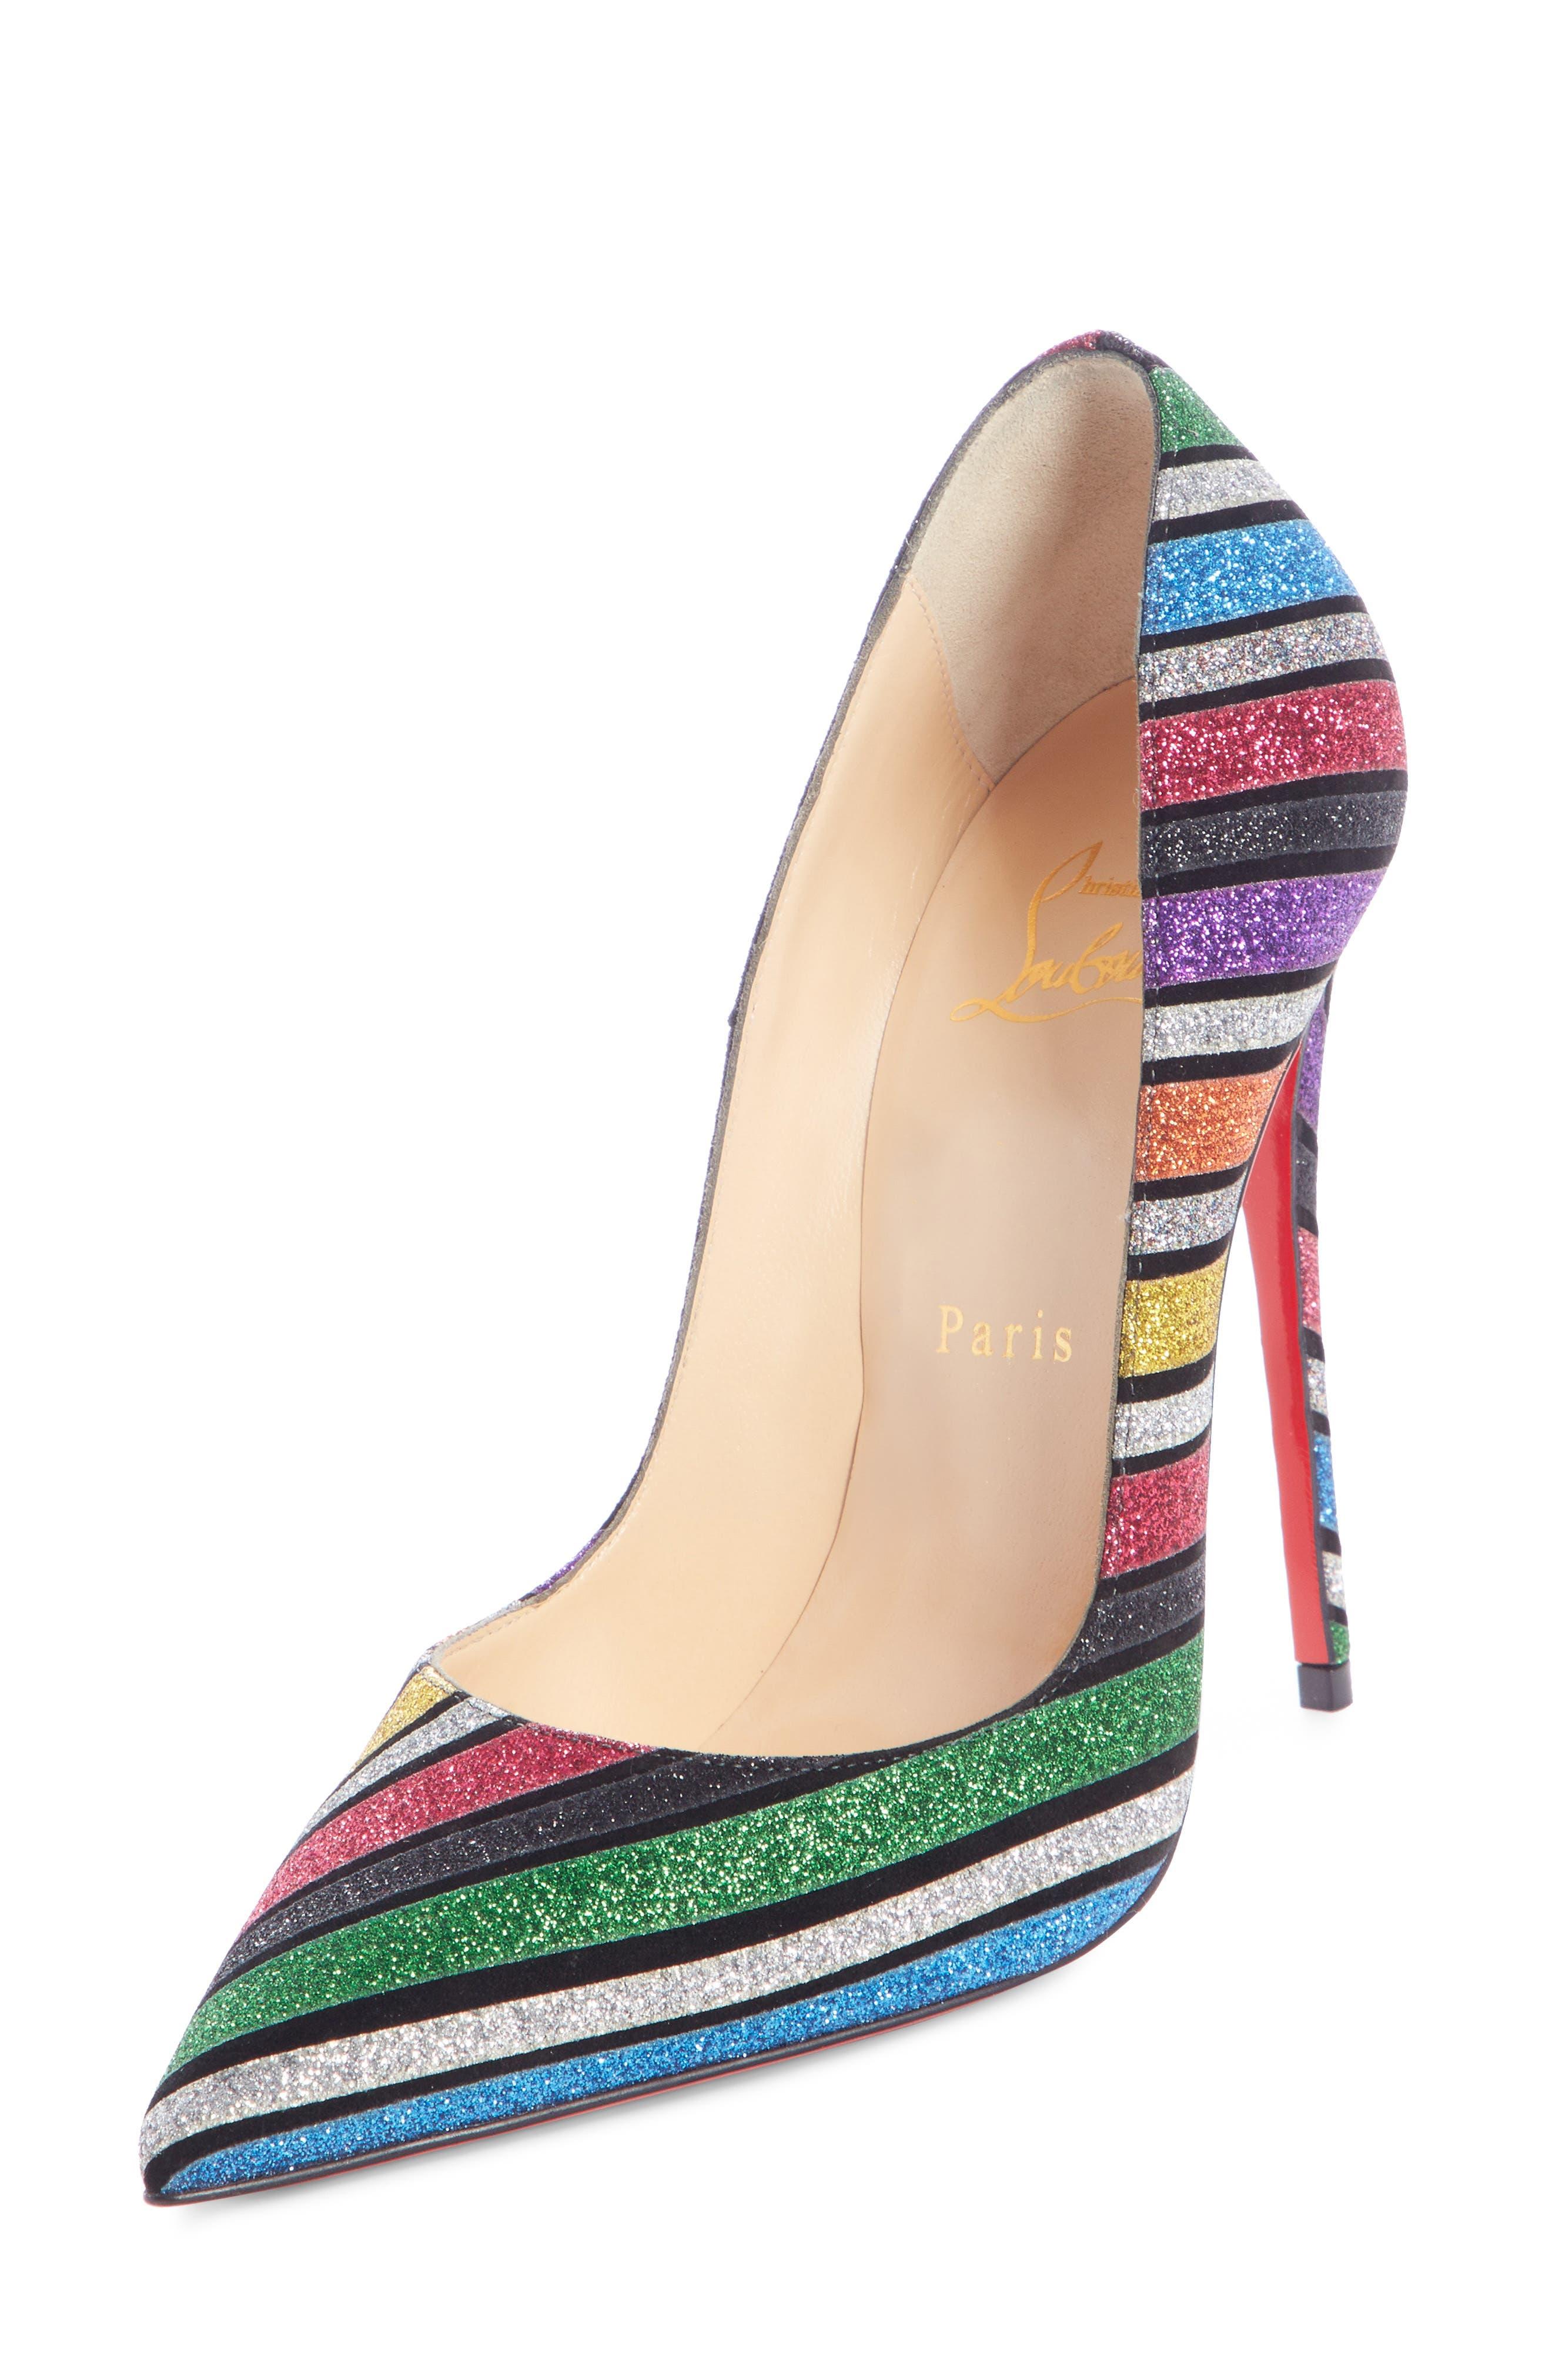 CHRISTIAN LOUBOUTIN, So Kate Glitter Stripe Pump, Main thumbnail 1, color, RAINBOW STRIPE